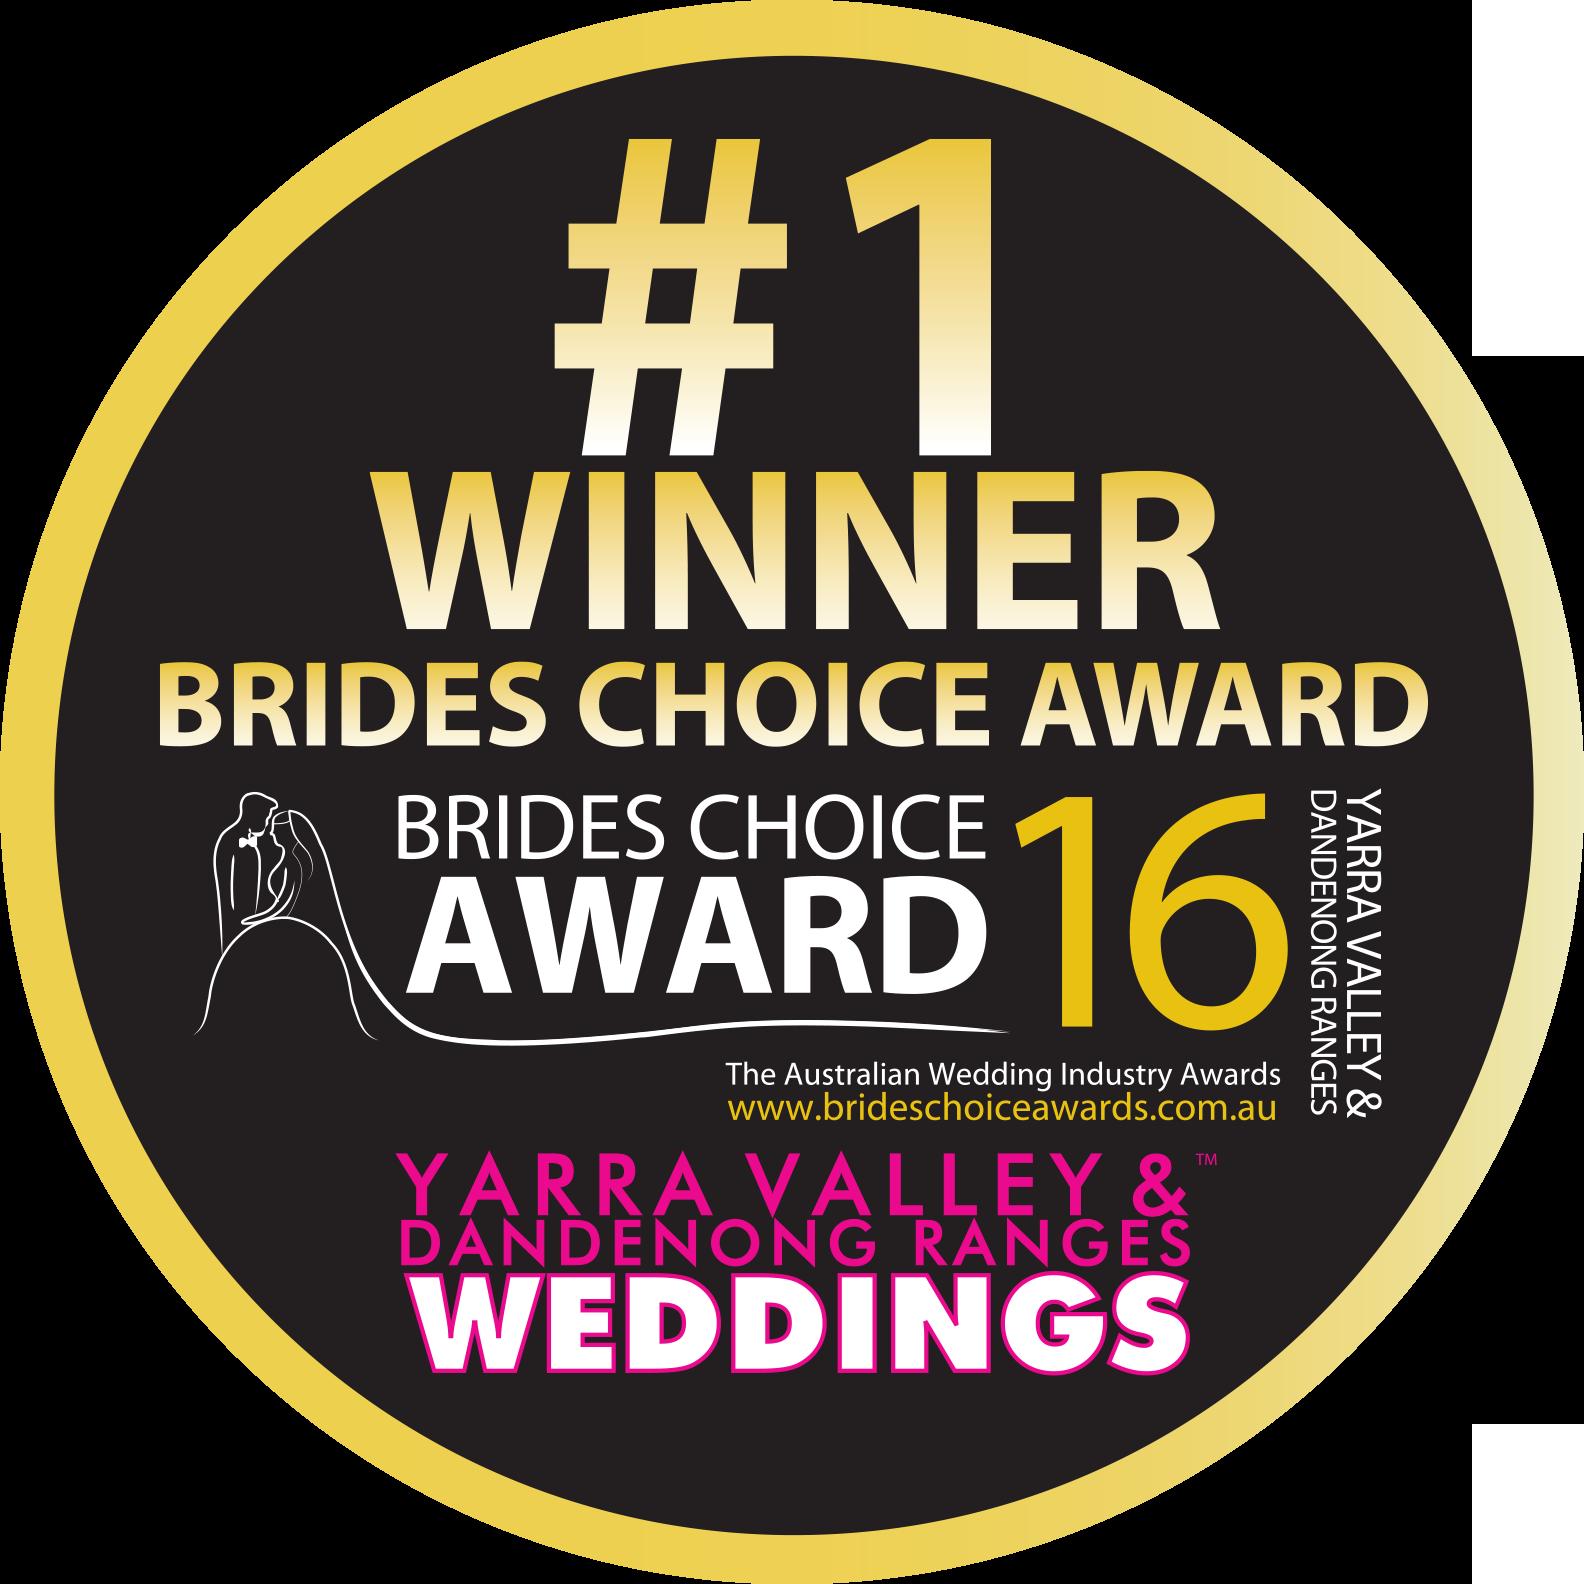 Yarra Valley Brides Choice Award WINNER Logo 16.png